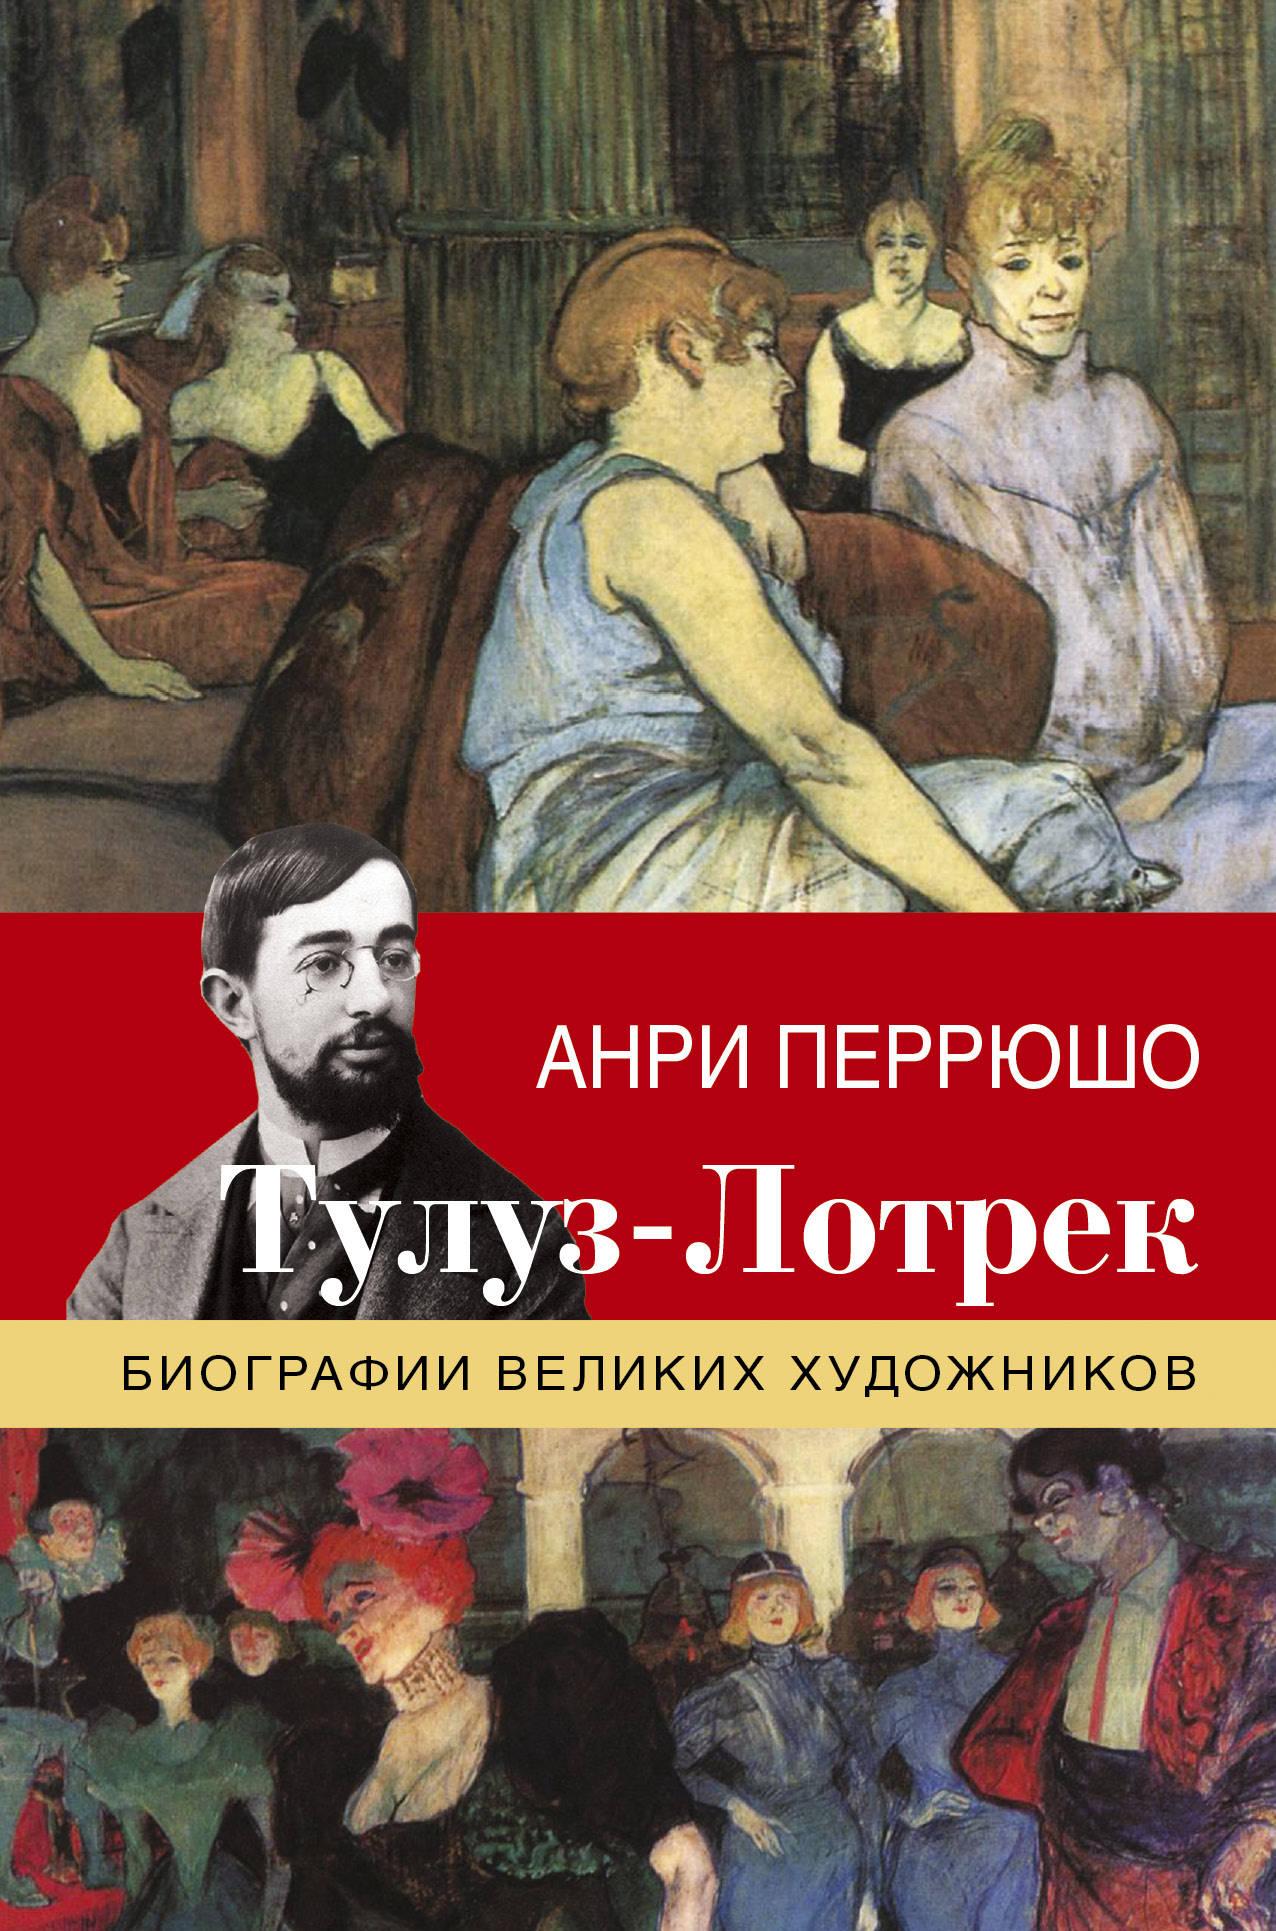 Перрюшо Анри Тулуз-Лотрек ISBN: 978-5-17-103320-0 анри де тулуз лотрек cdpc